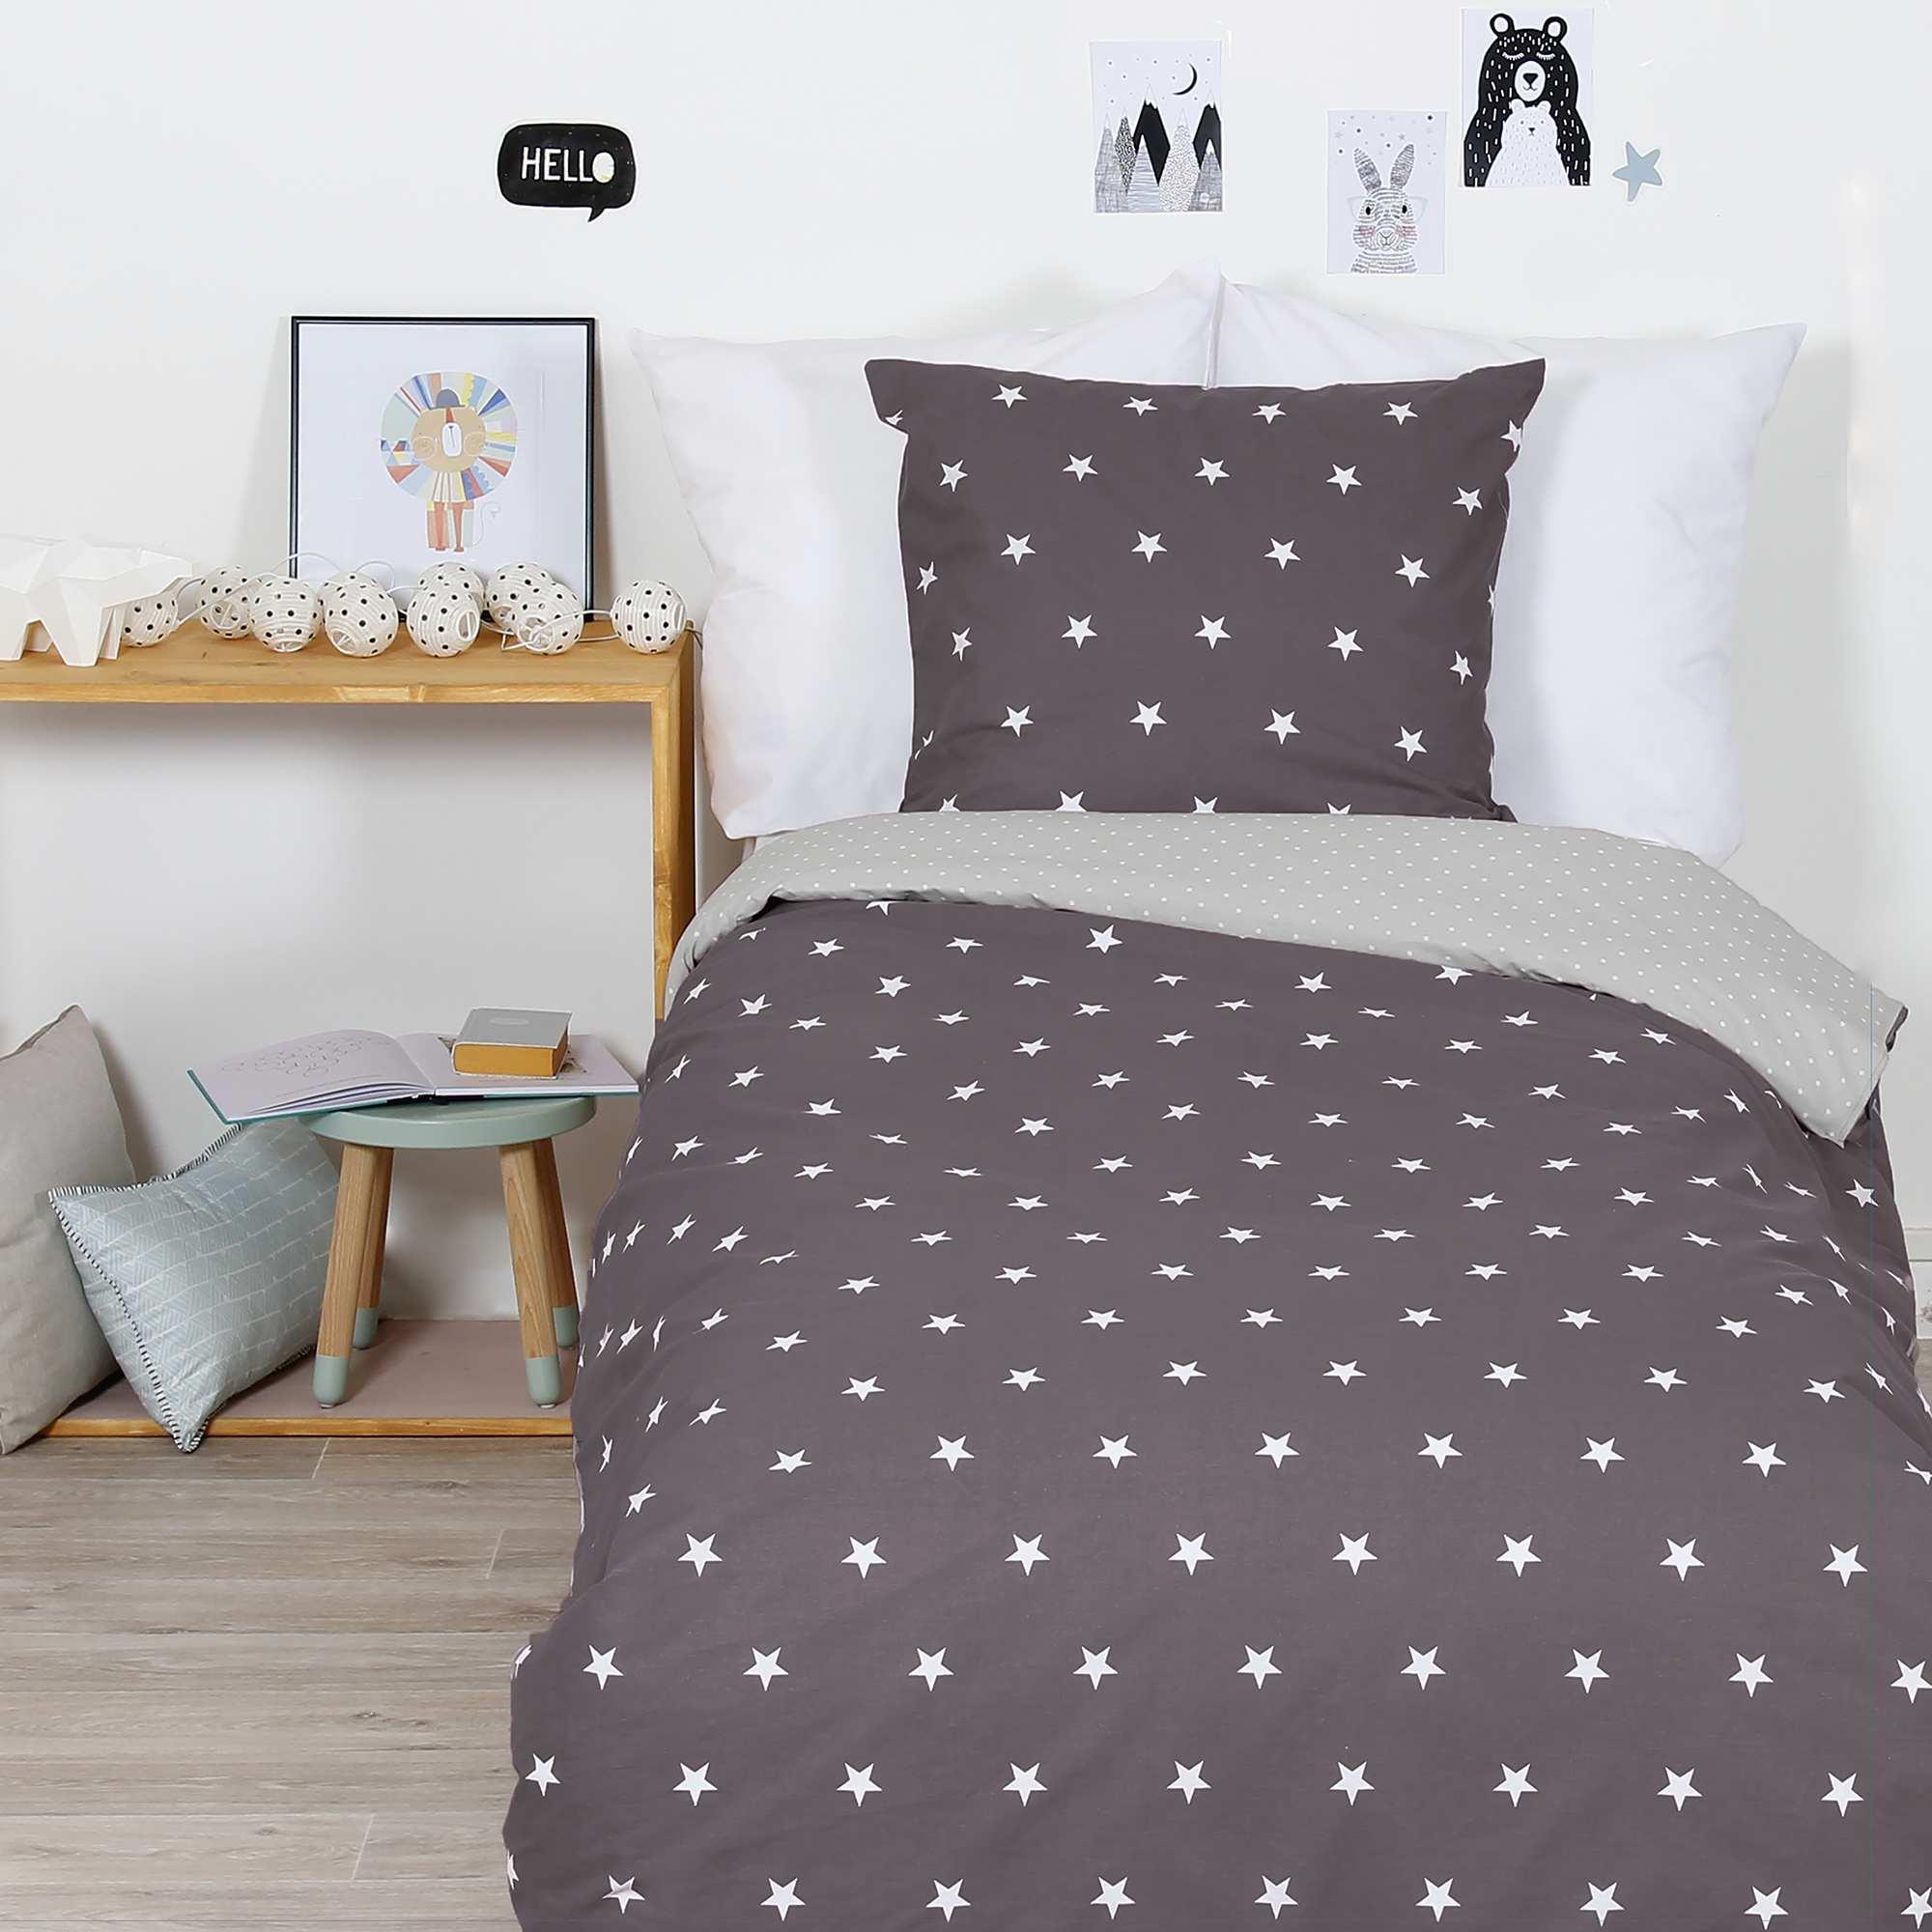 Juego de cama 39 estrellas 39 hogar gris beige kiabi 25 00 - Kiabi hogar ...